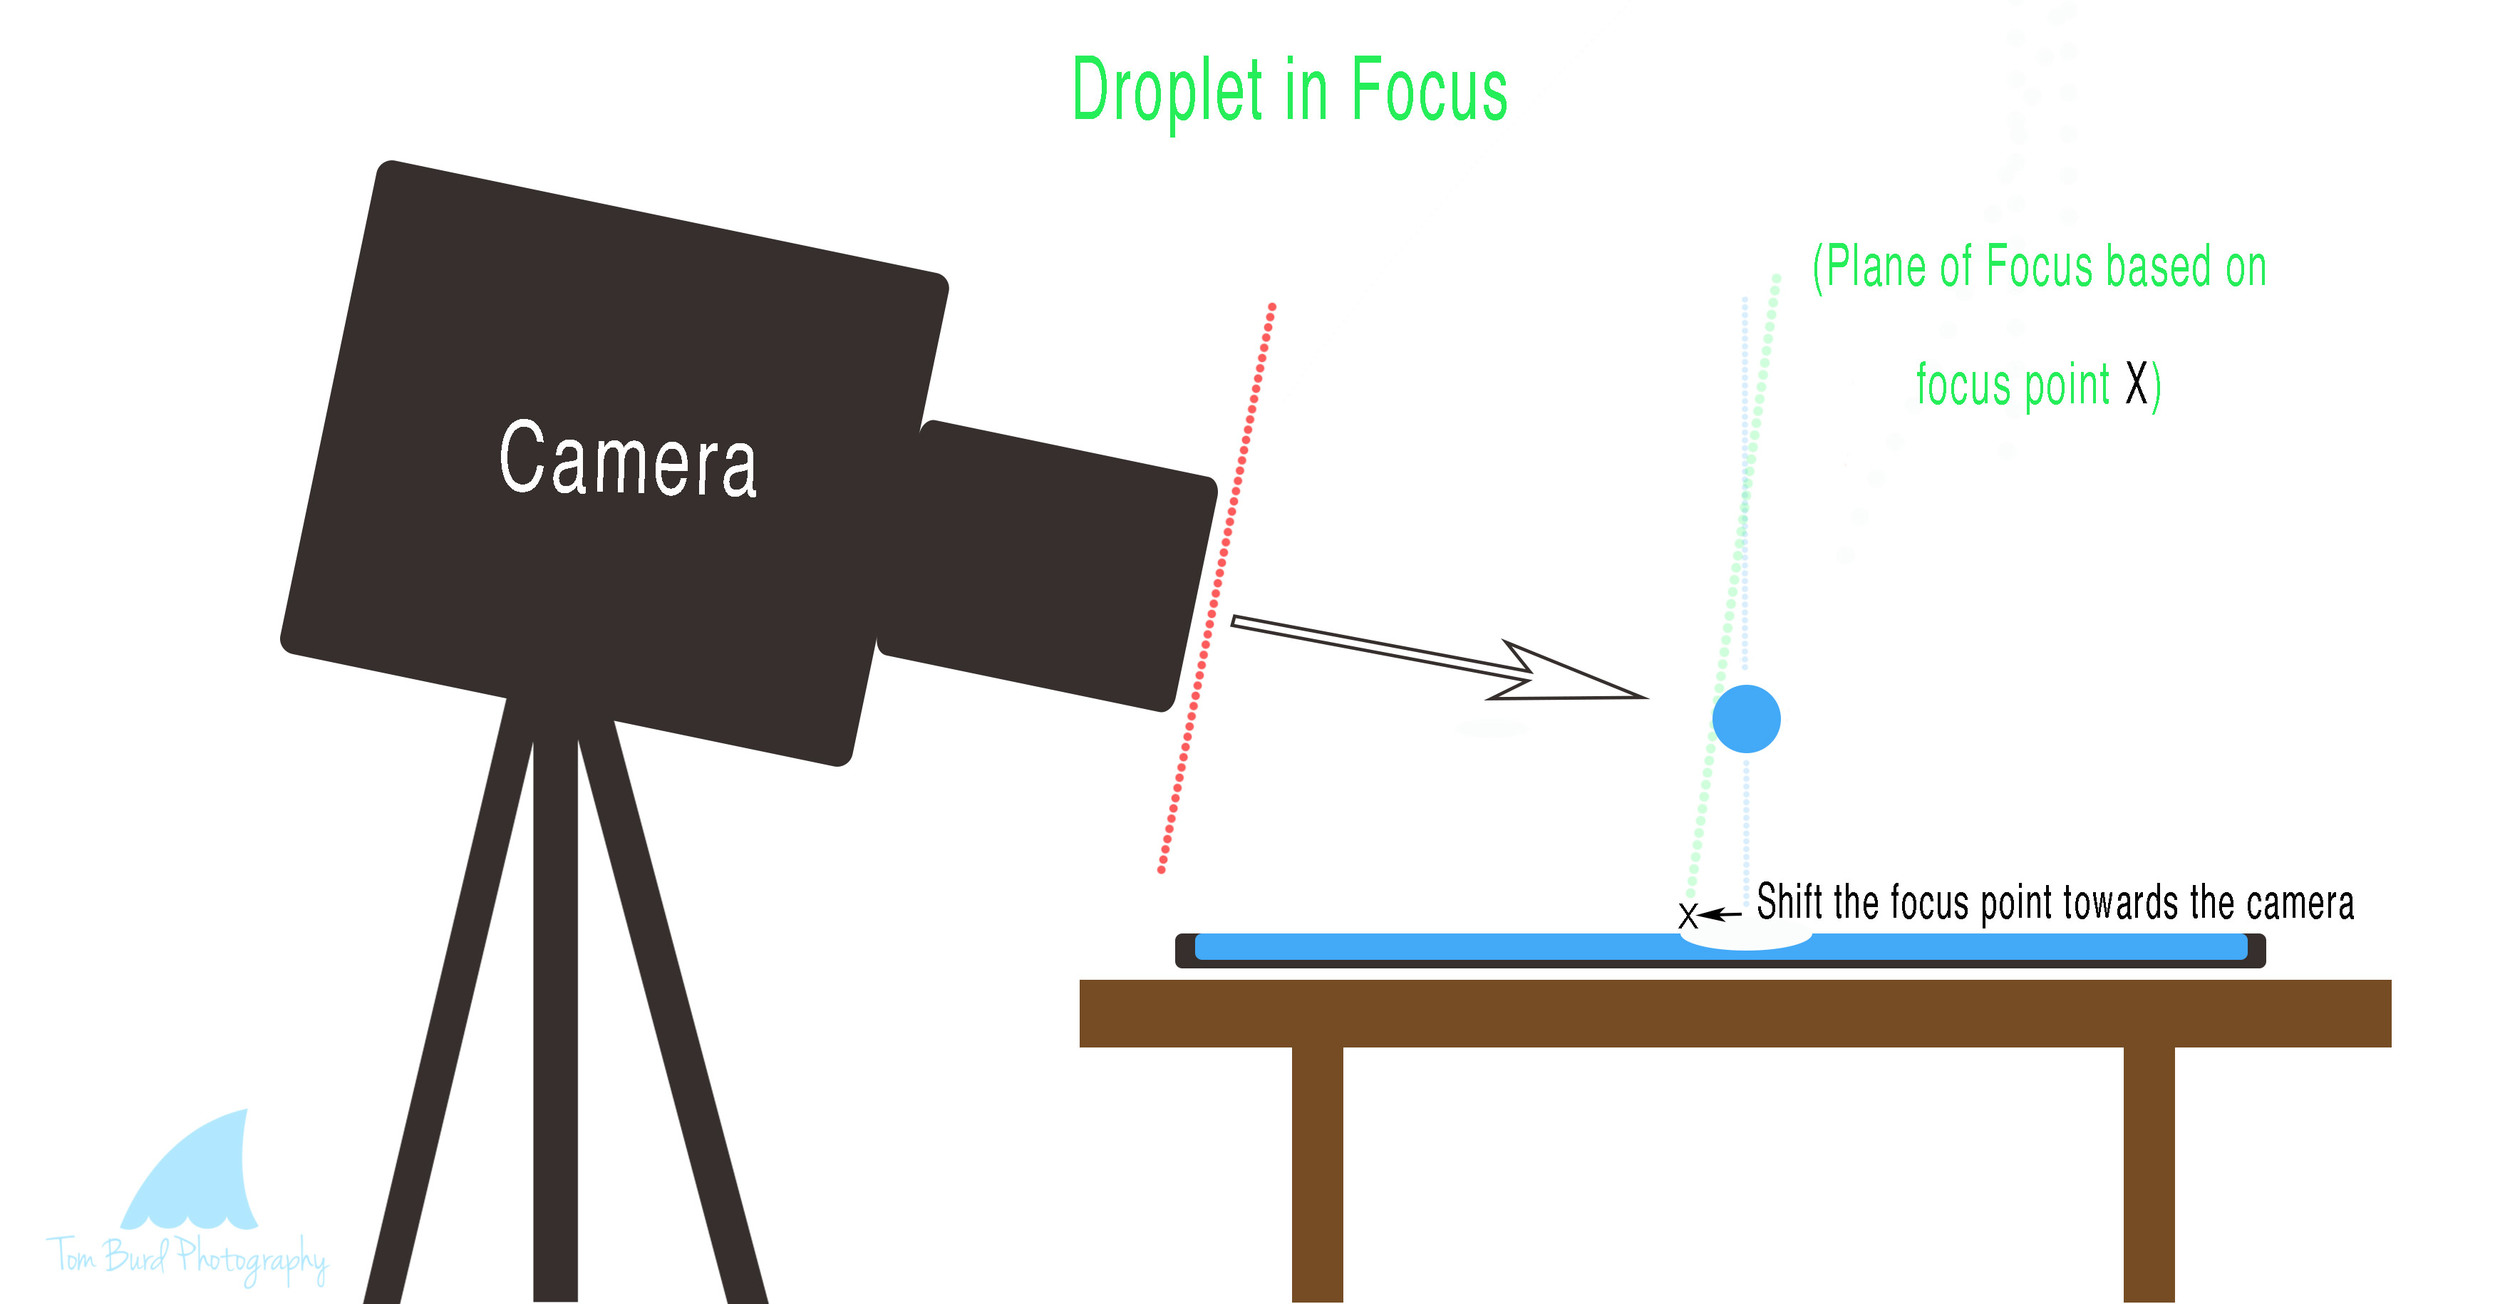 Water Droplet in Focus Diagram